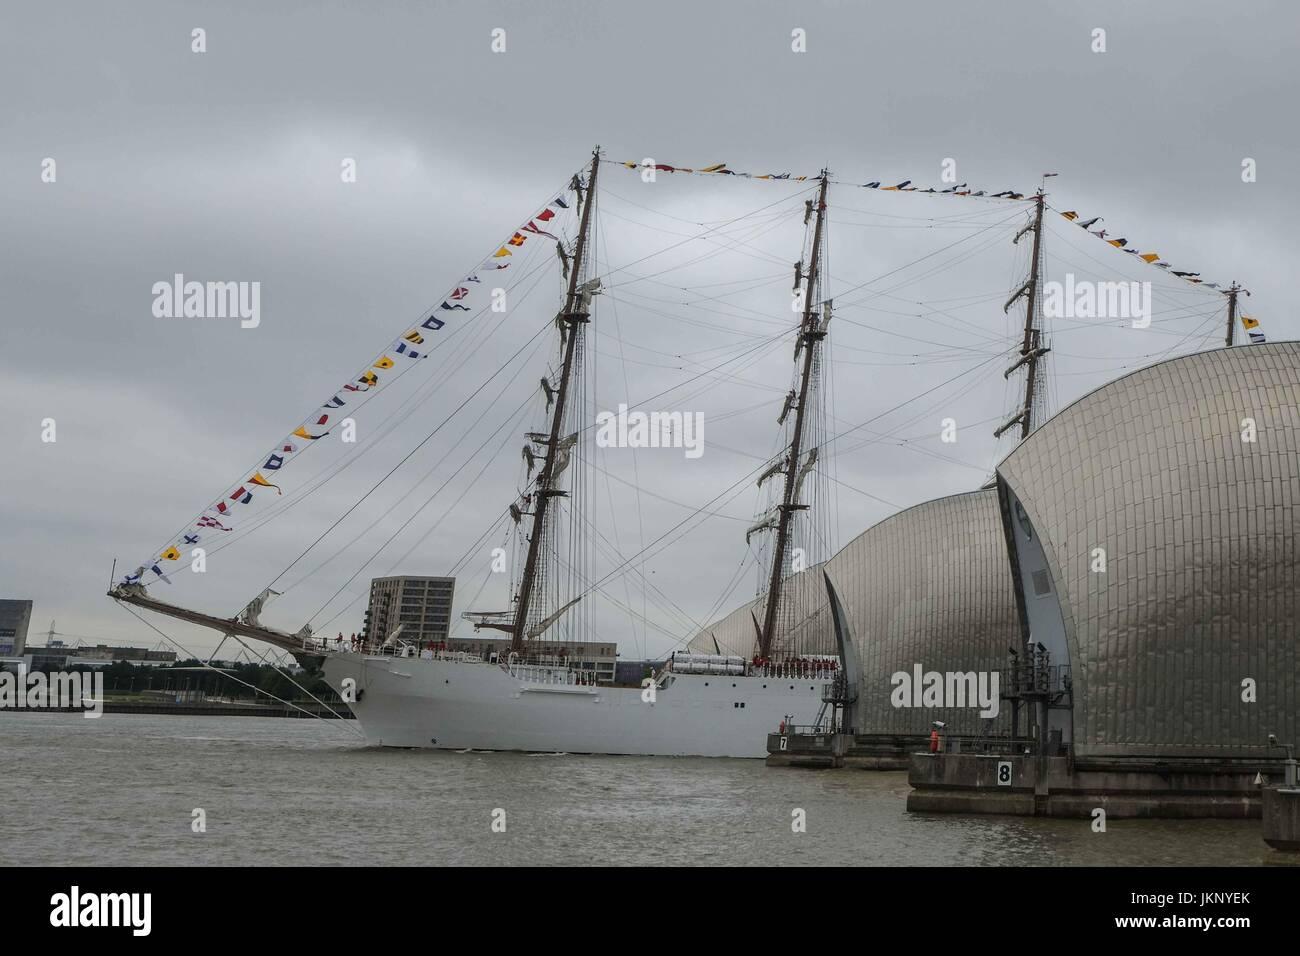 London, UK  24th July 2017. 115 metre long Peruvian Navy training ship, BAP Union, Passes through the Thames Barrier Stock Photo